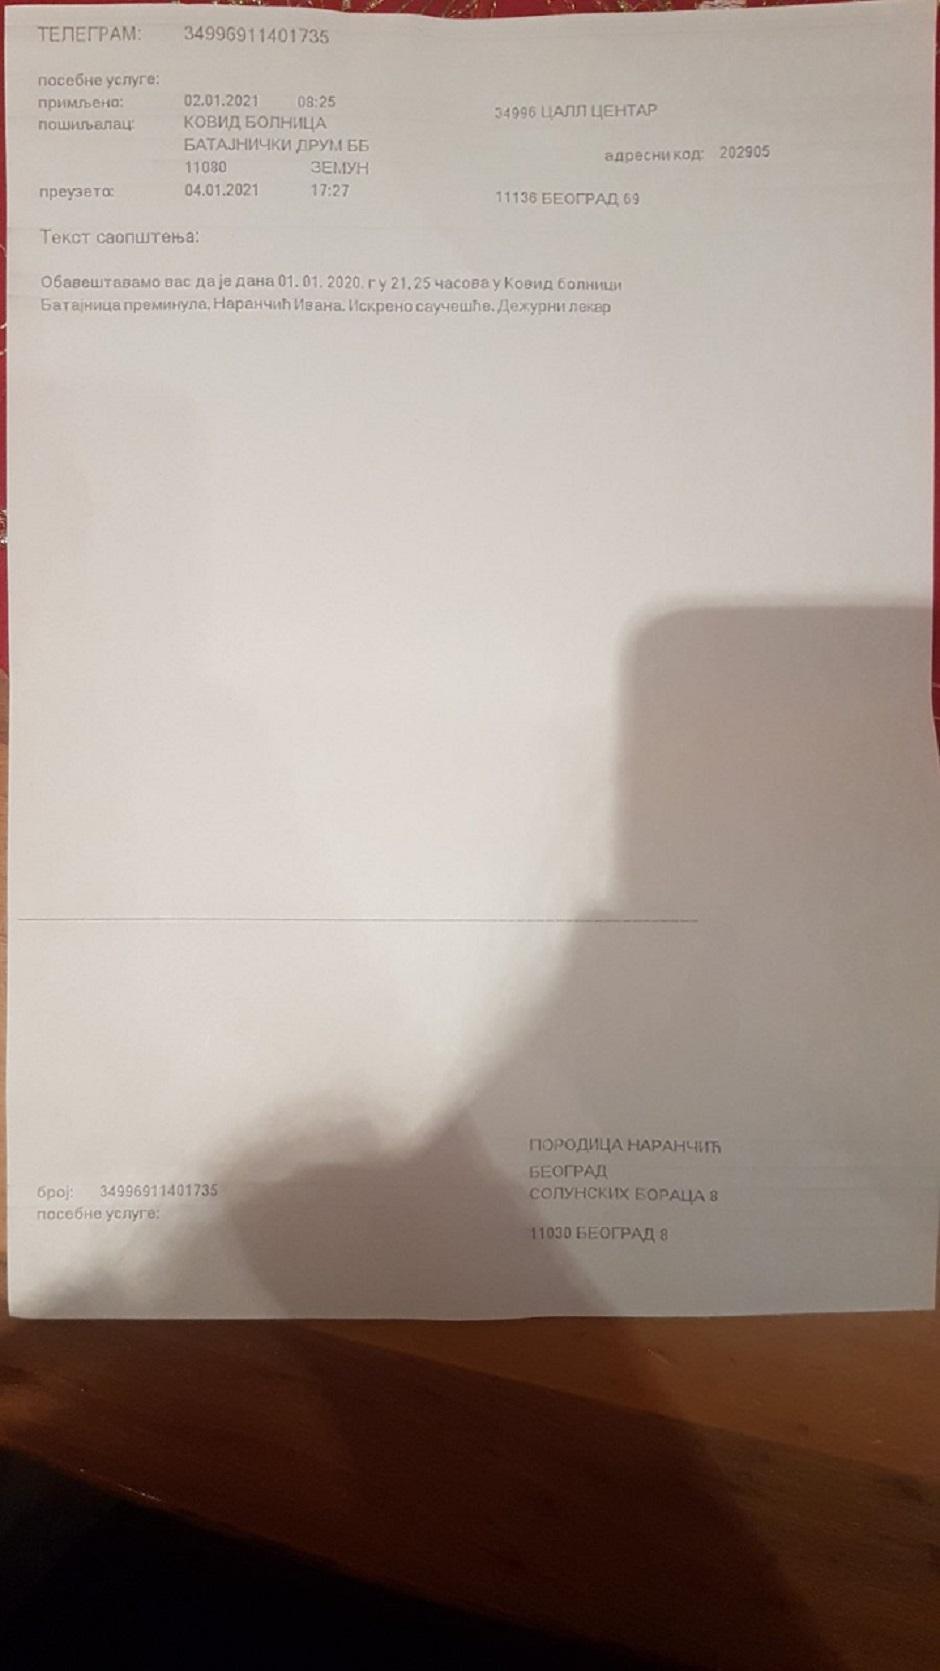 Telegram stigao posle četiri dana, FOTO: Privatna arhiva